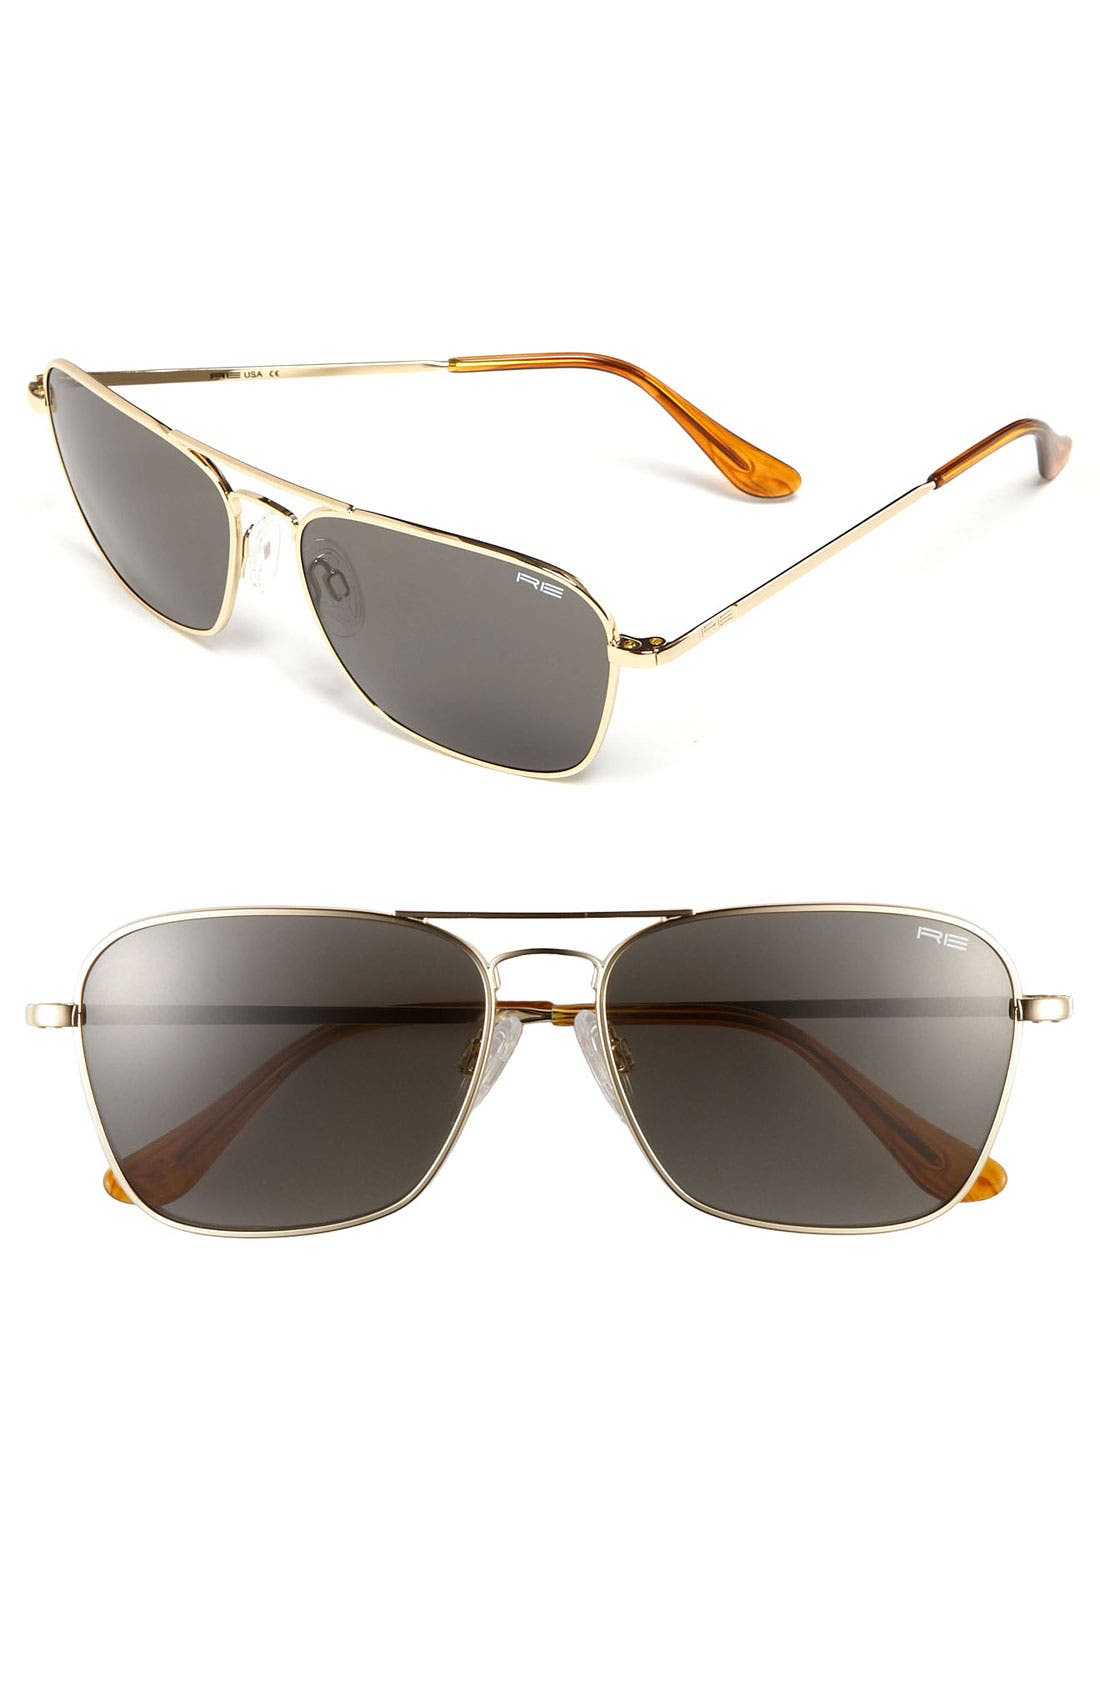 Alternate Image 1 Selected - Randolph Engineering 'Intruder' 58mm Sunglasses